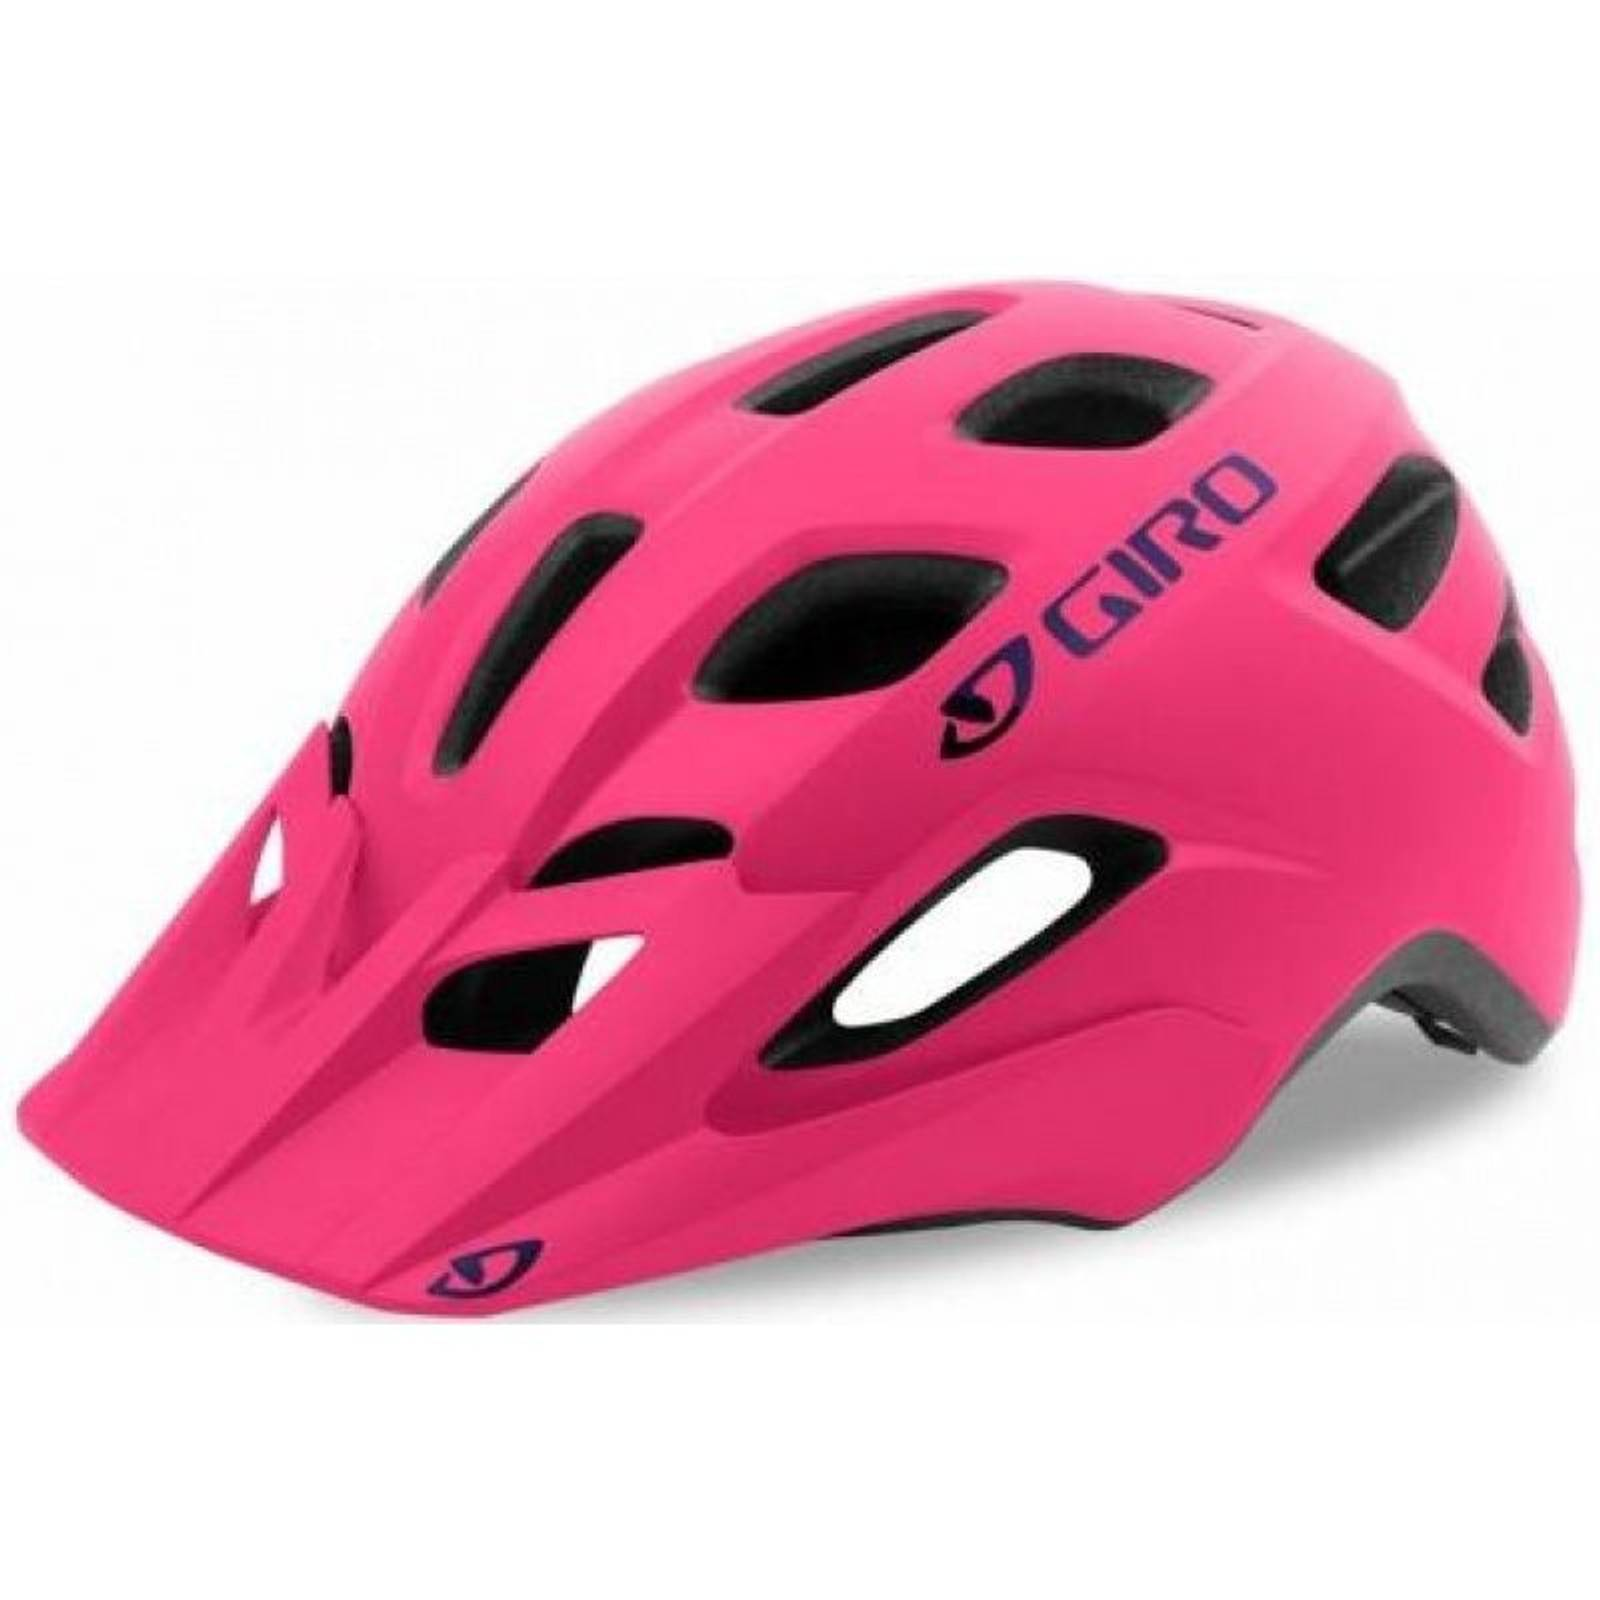 Capacete Giro - Tremor - Rosa Fosco